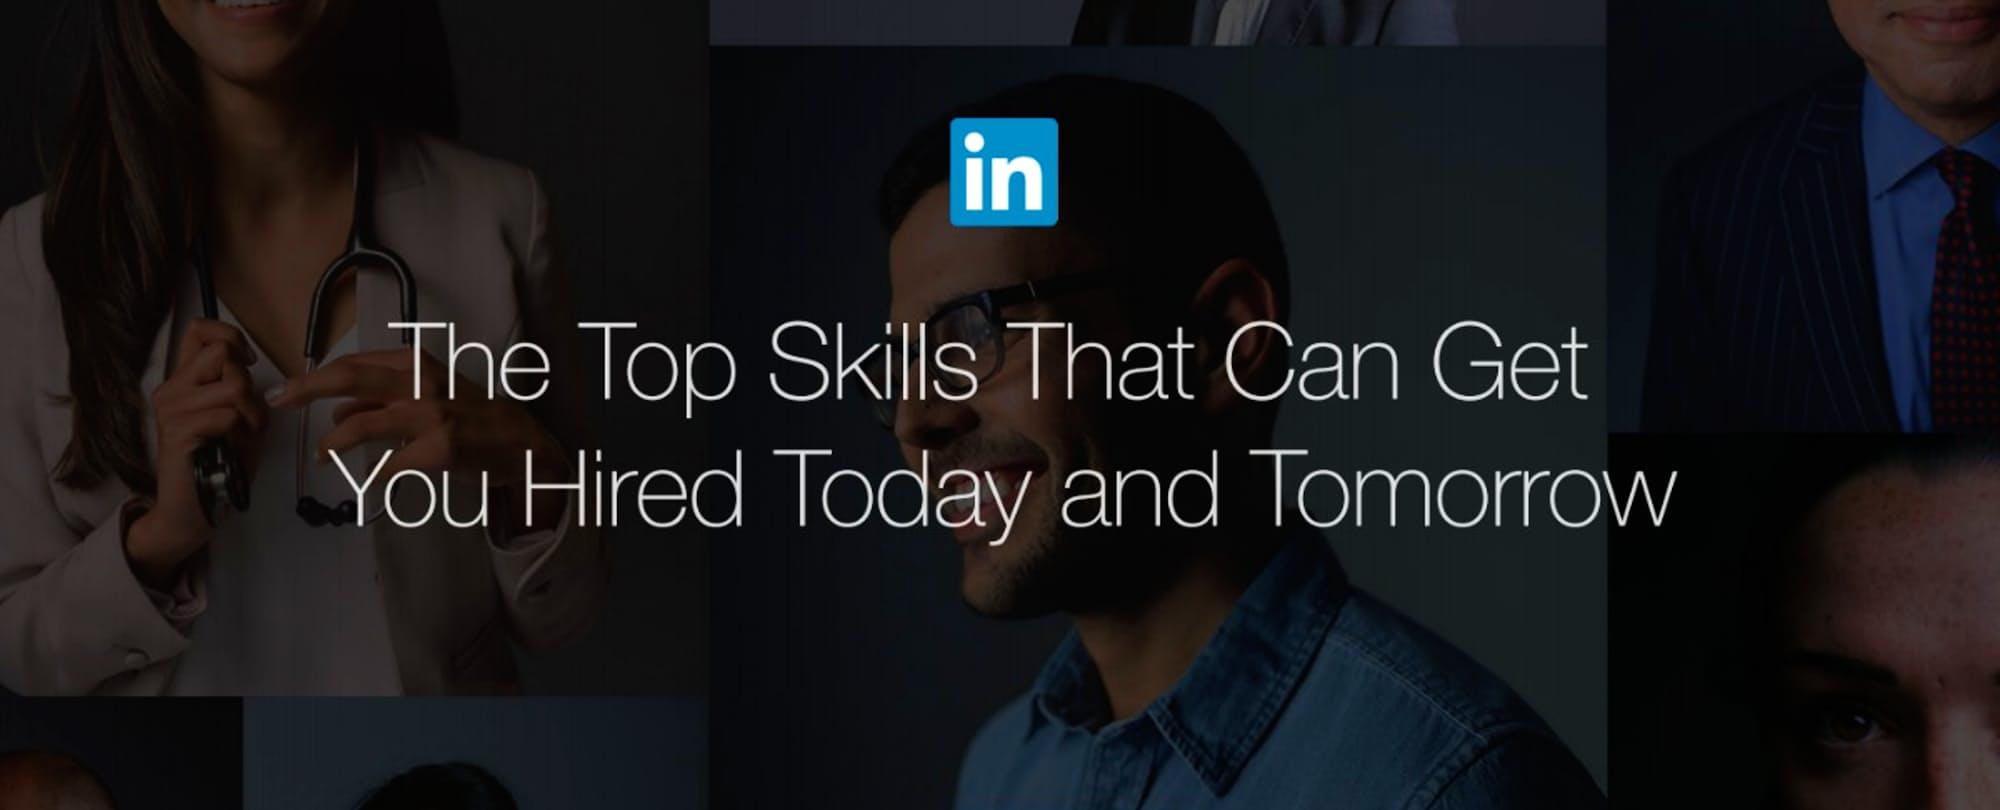 Image Credit: LinkedIn